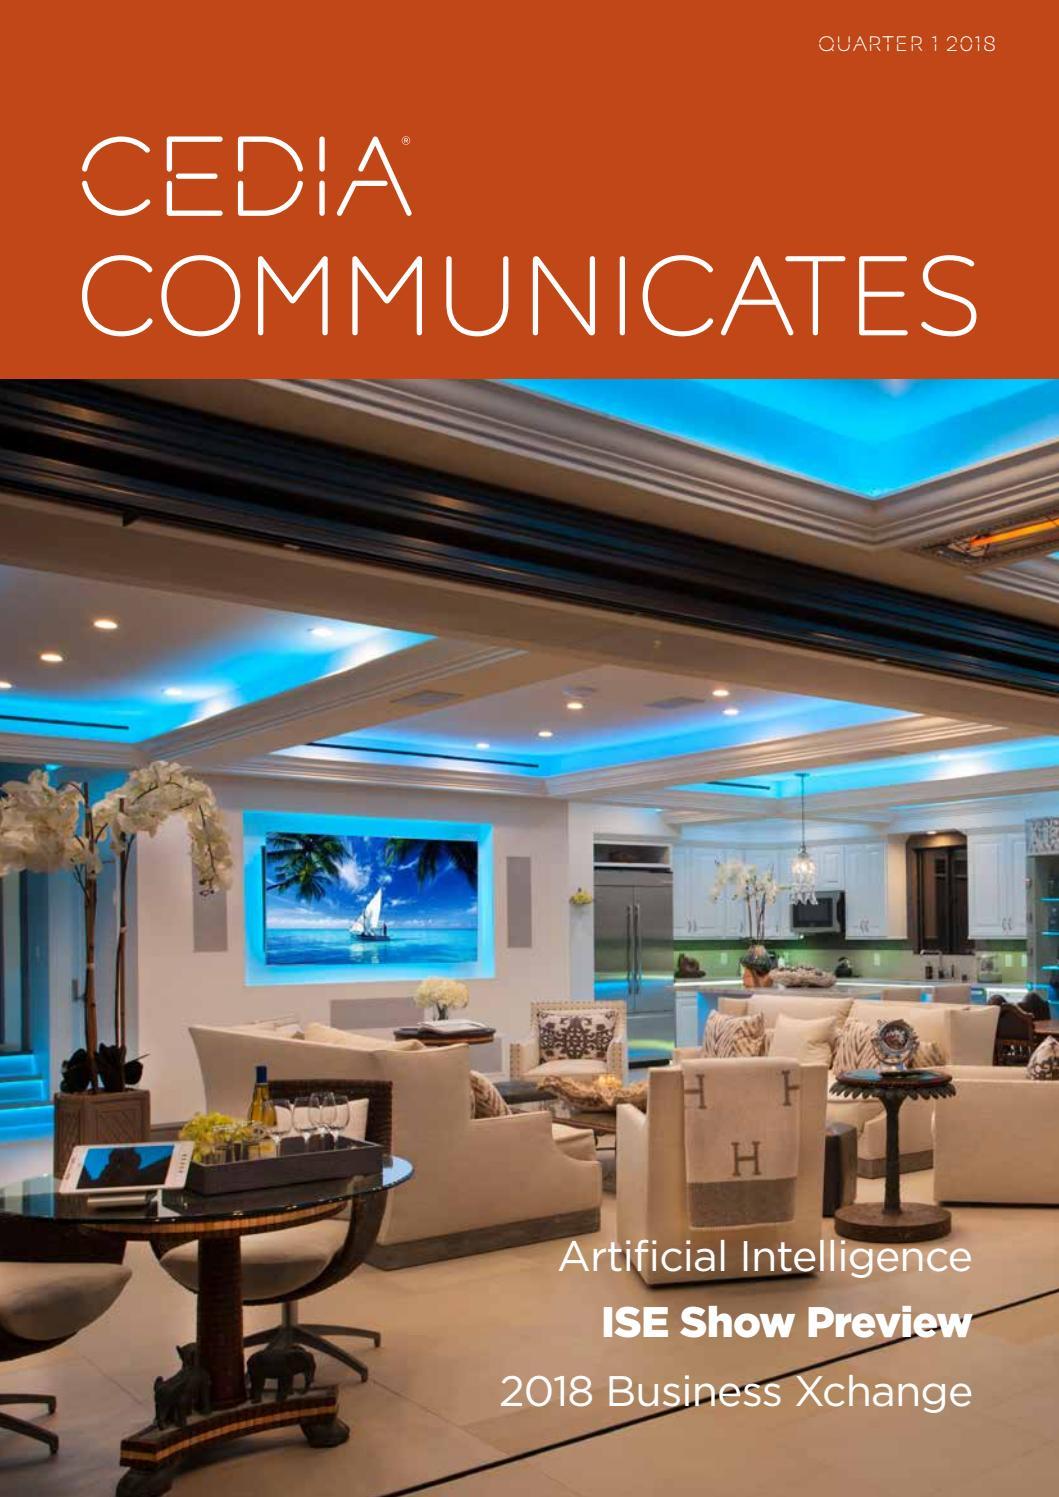 Cedia Communicates Quarter 1 2018 By Cedia Emea Issuu